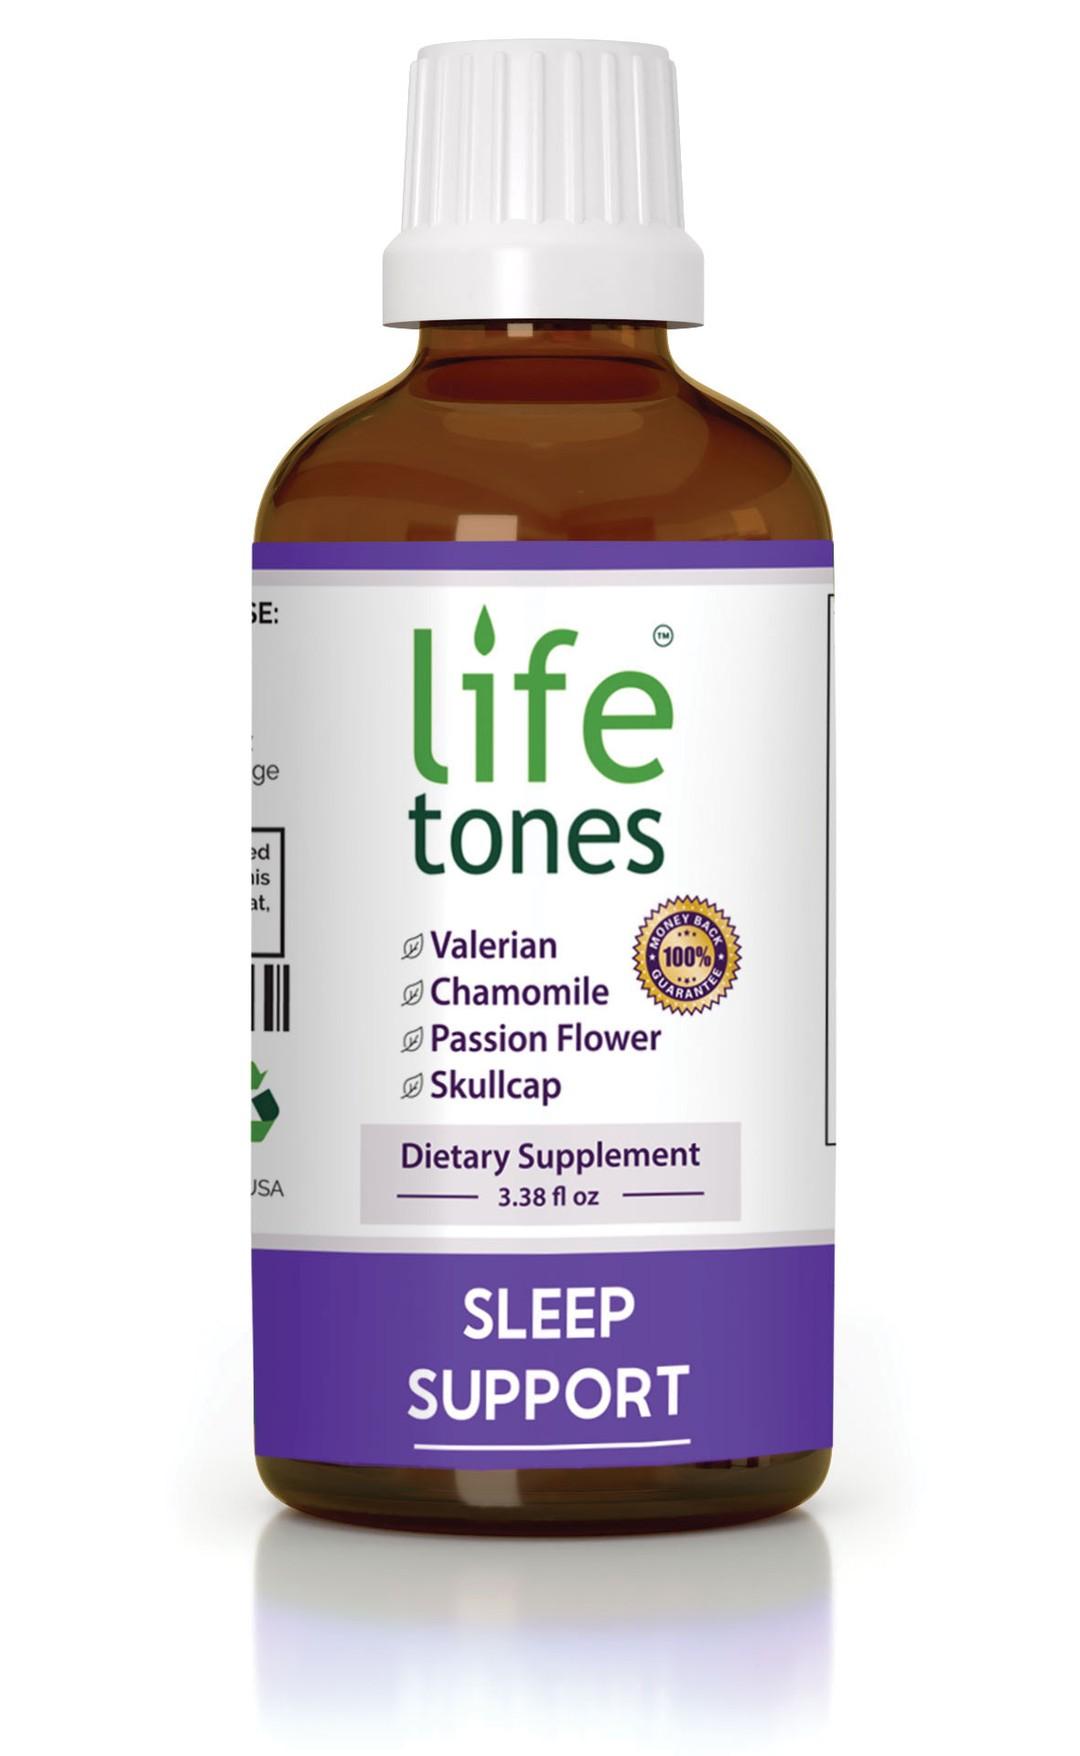 Lifetones Sleep Support